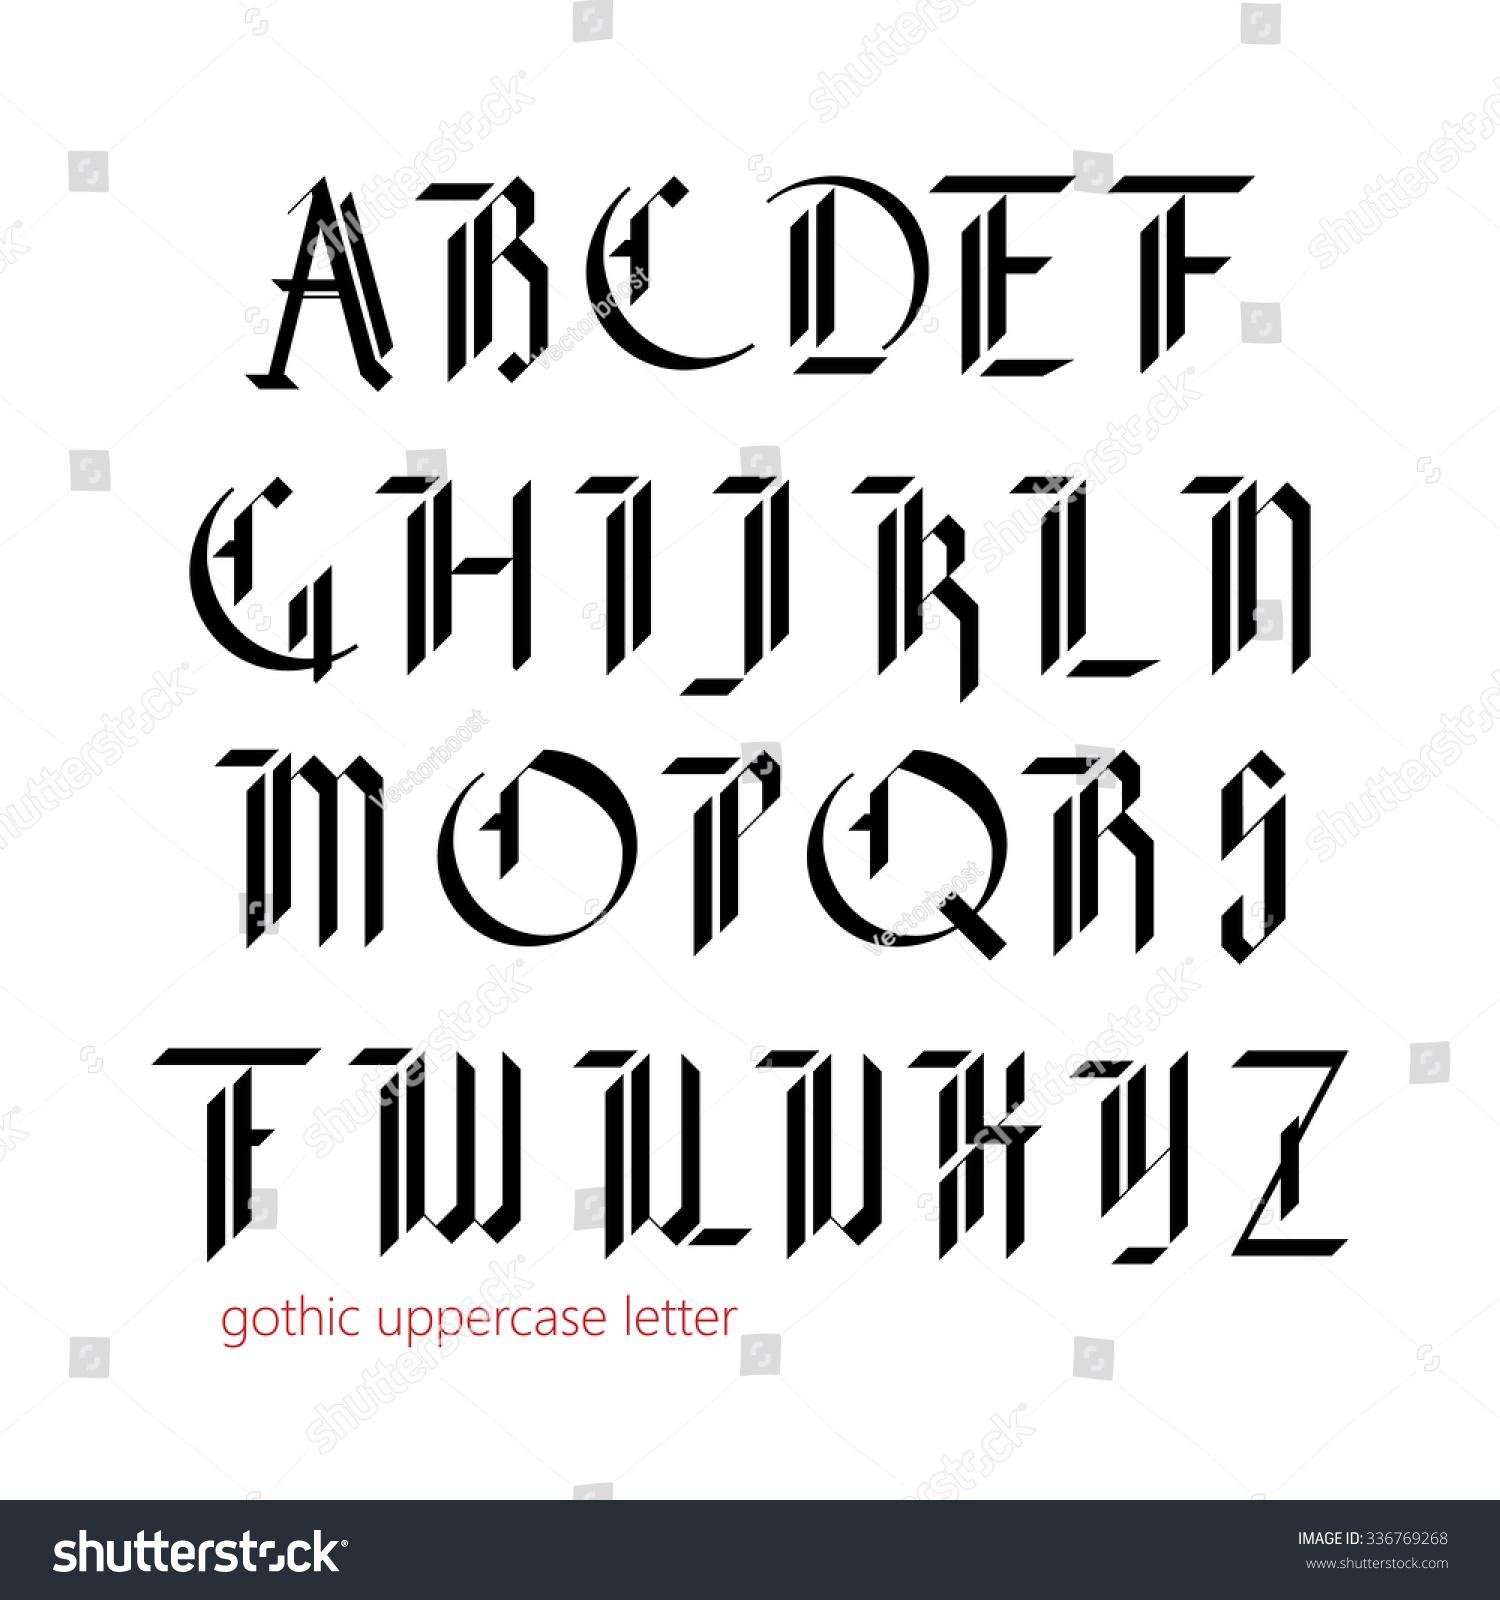 Blackletter modern gothic font all uppercase stock vector